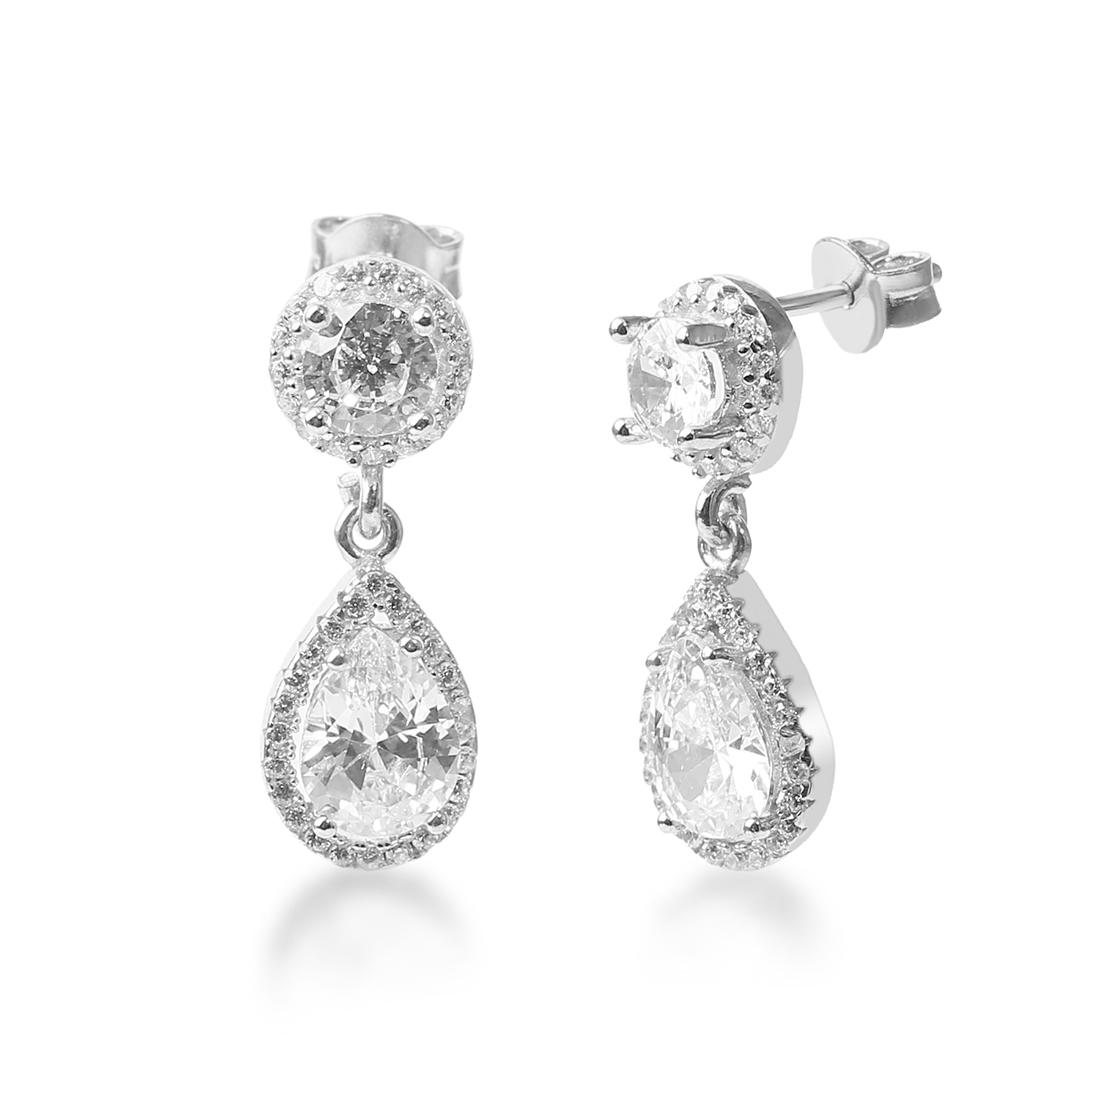 Amara Silver Drop Earring - High Street Jewelry